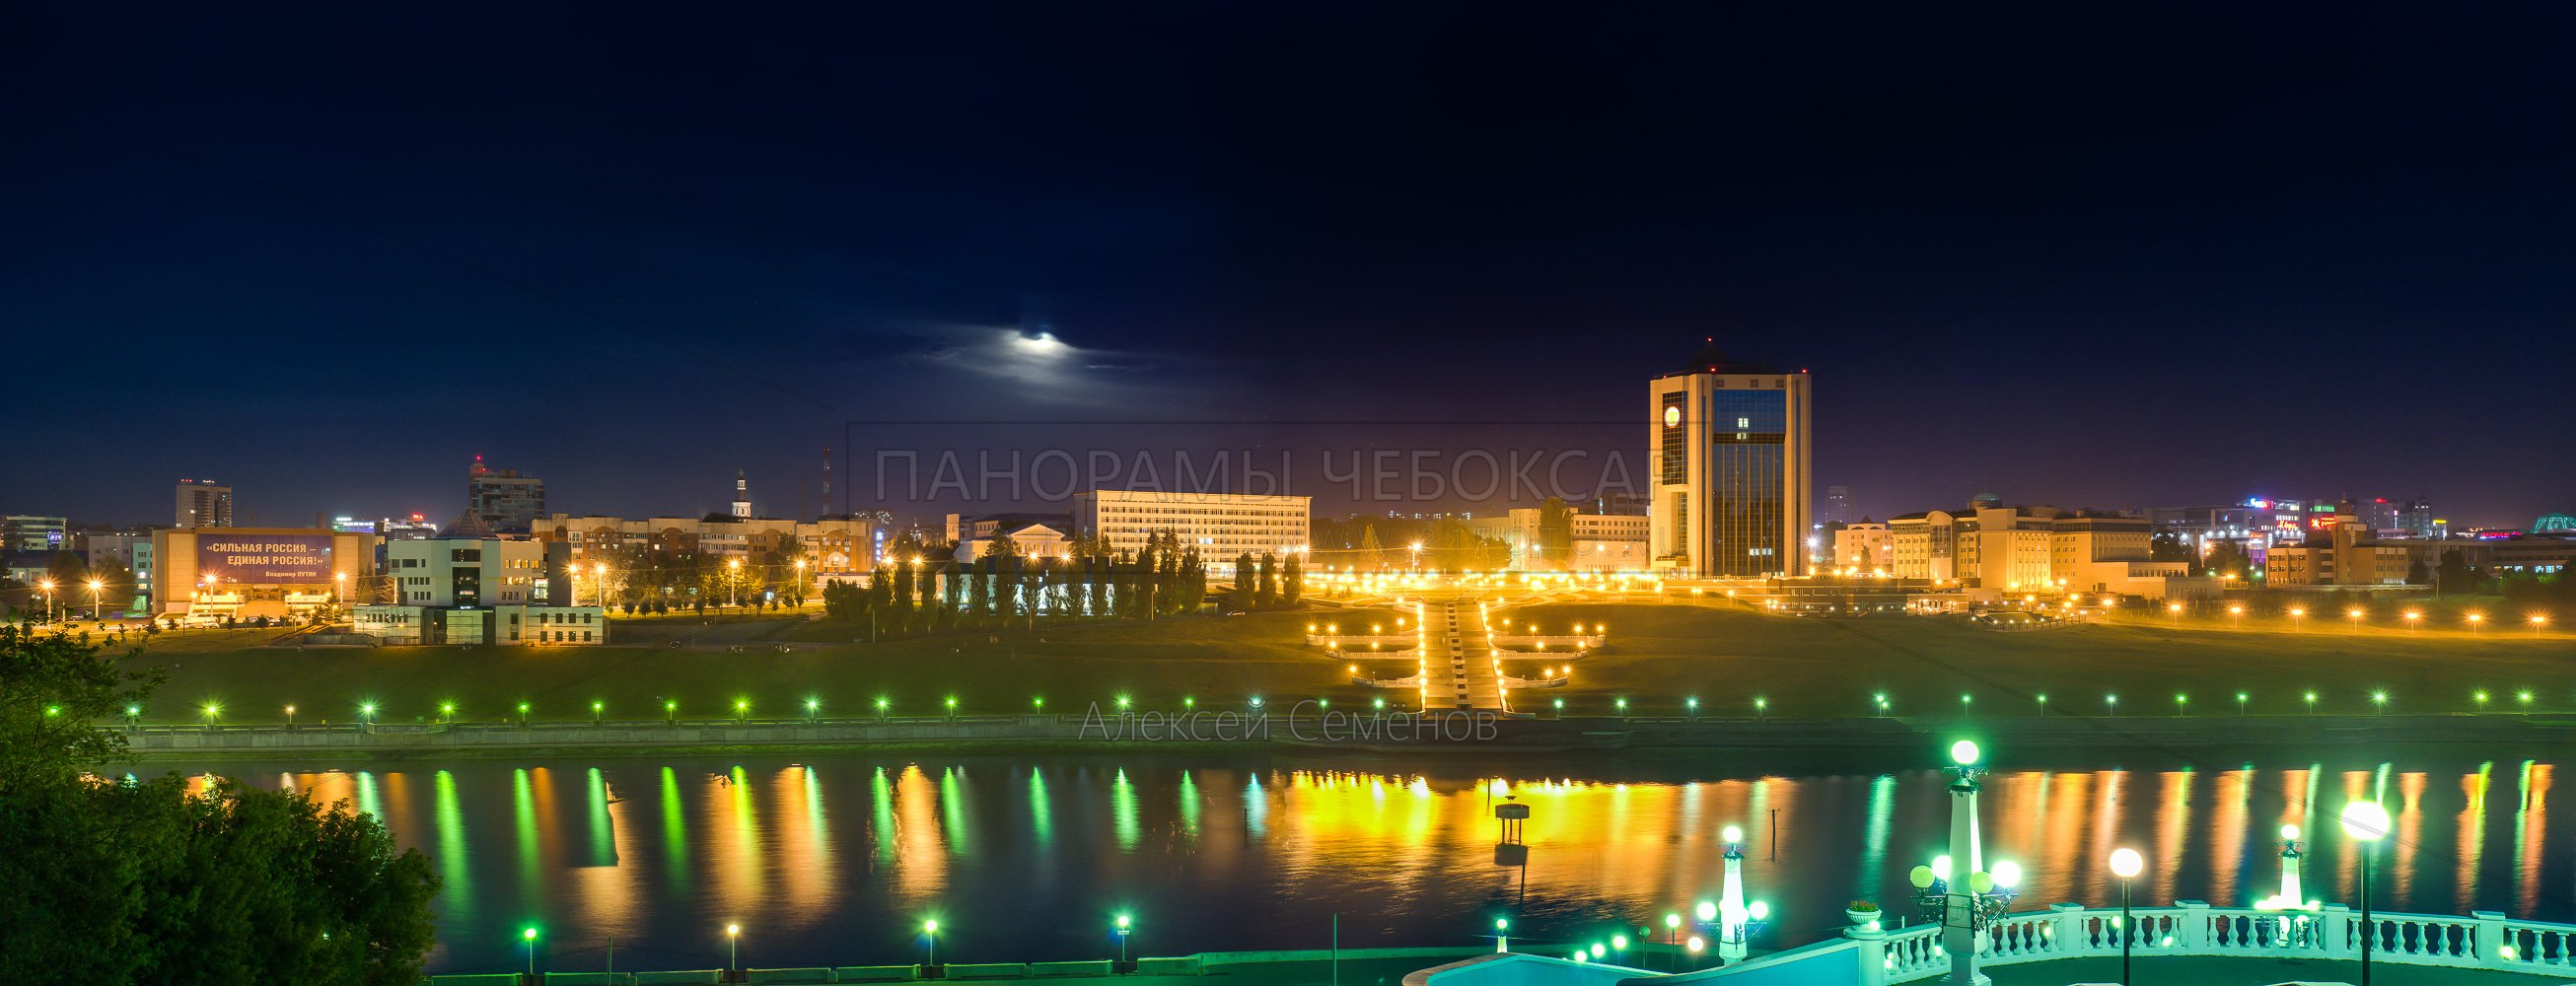 Ночной залив в Чебоксарах 2016